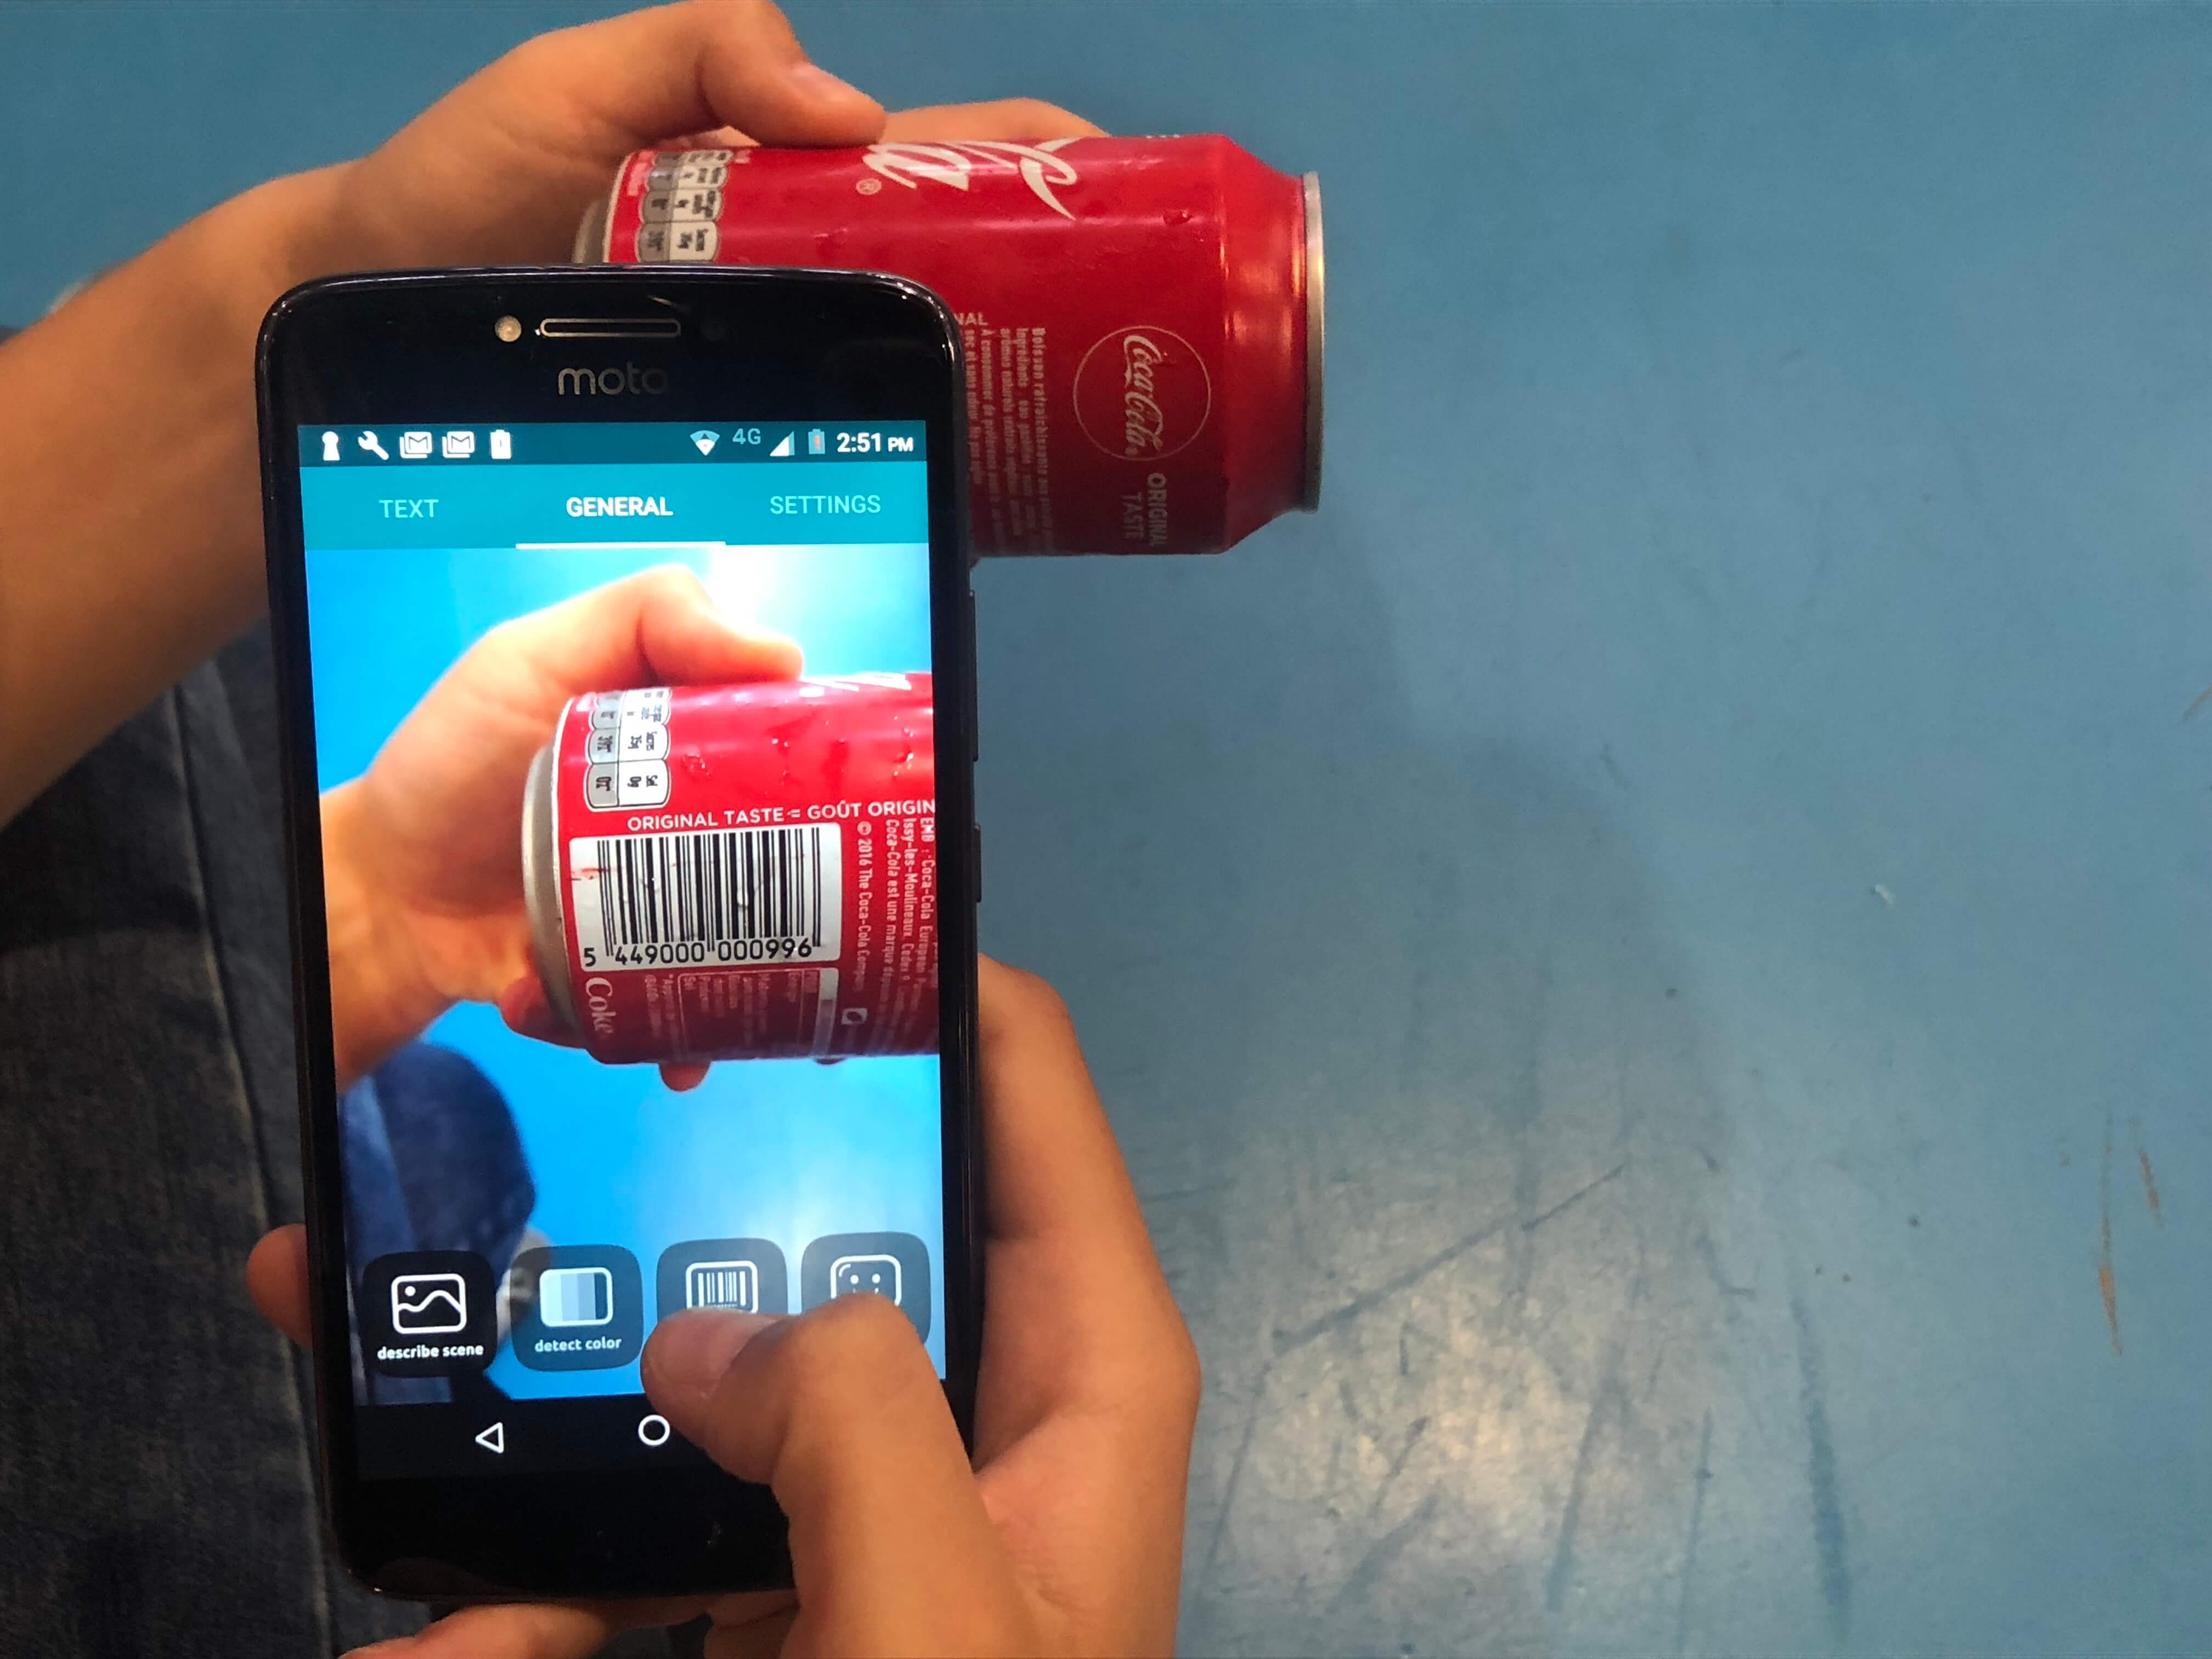 Envision, Coca Cola kutusundaki barkodu tanımlıyor